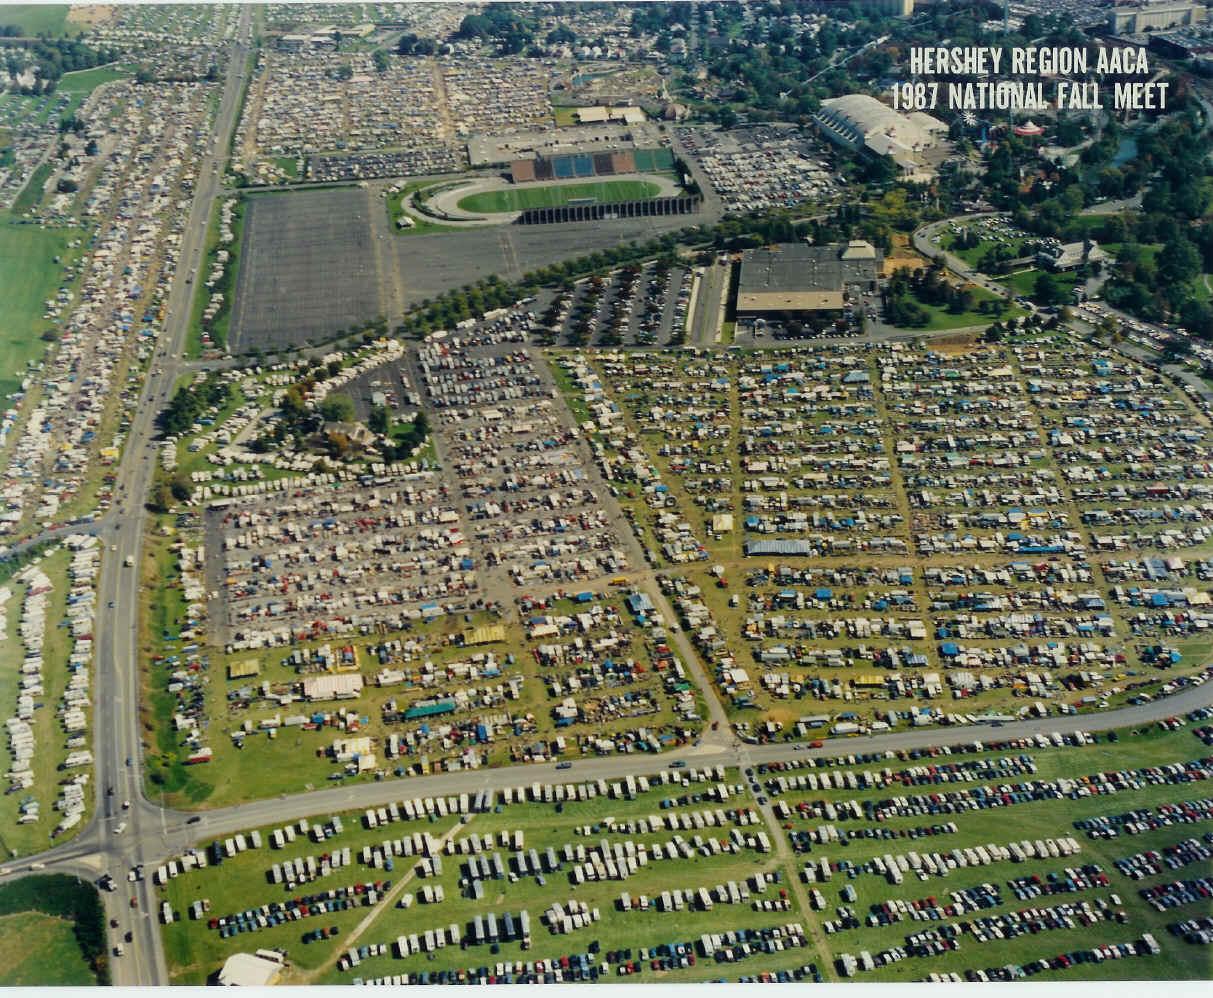 Hershey Car Show 2018 >> Hershey Region AACA: Fall Meet Maps & Information